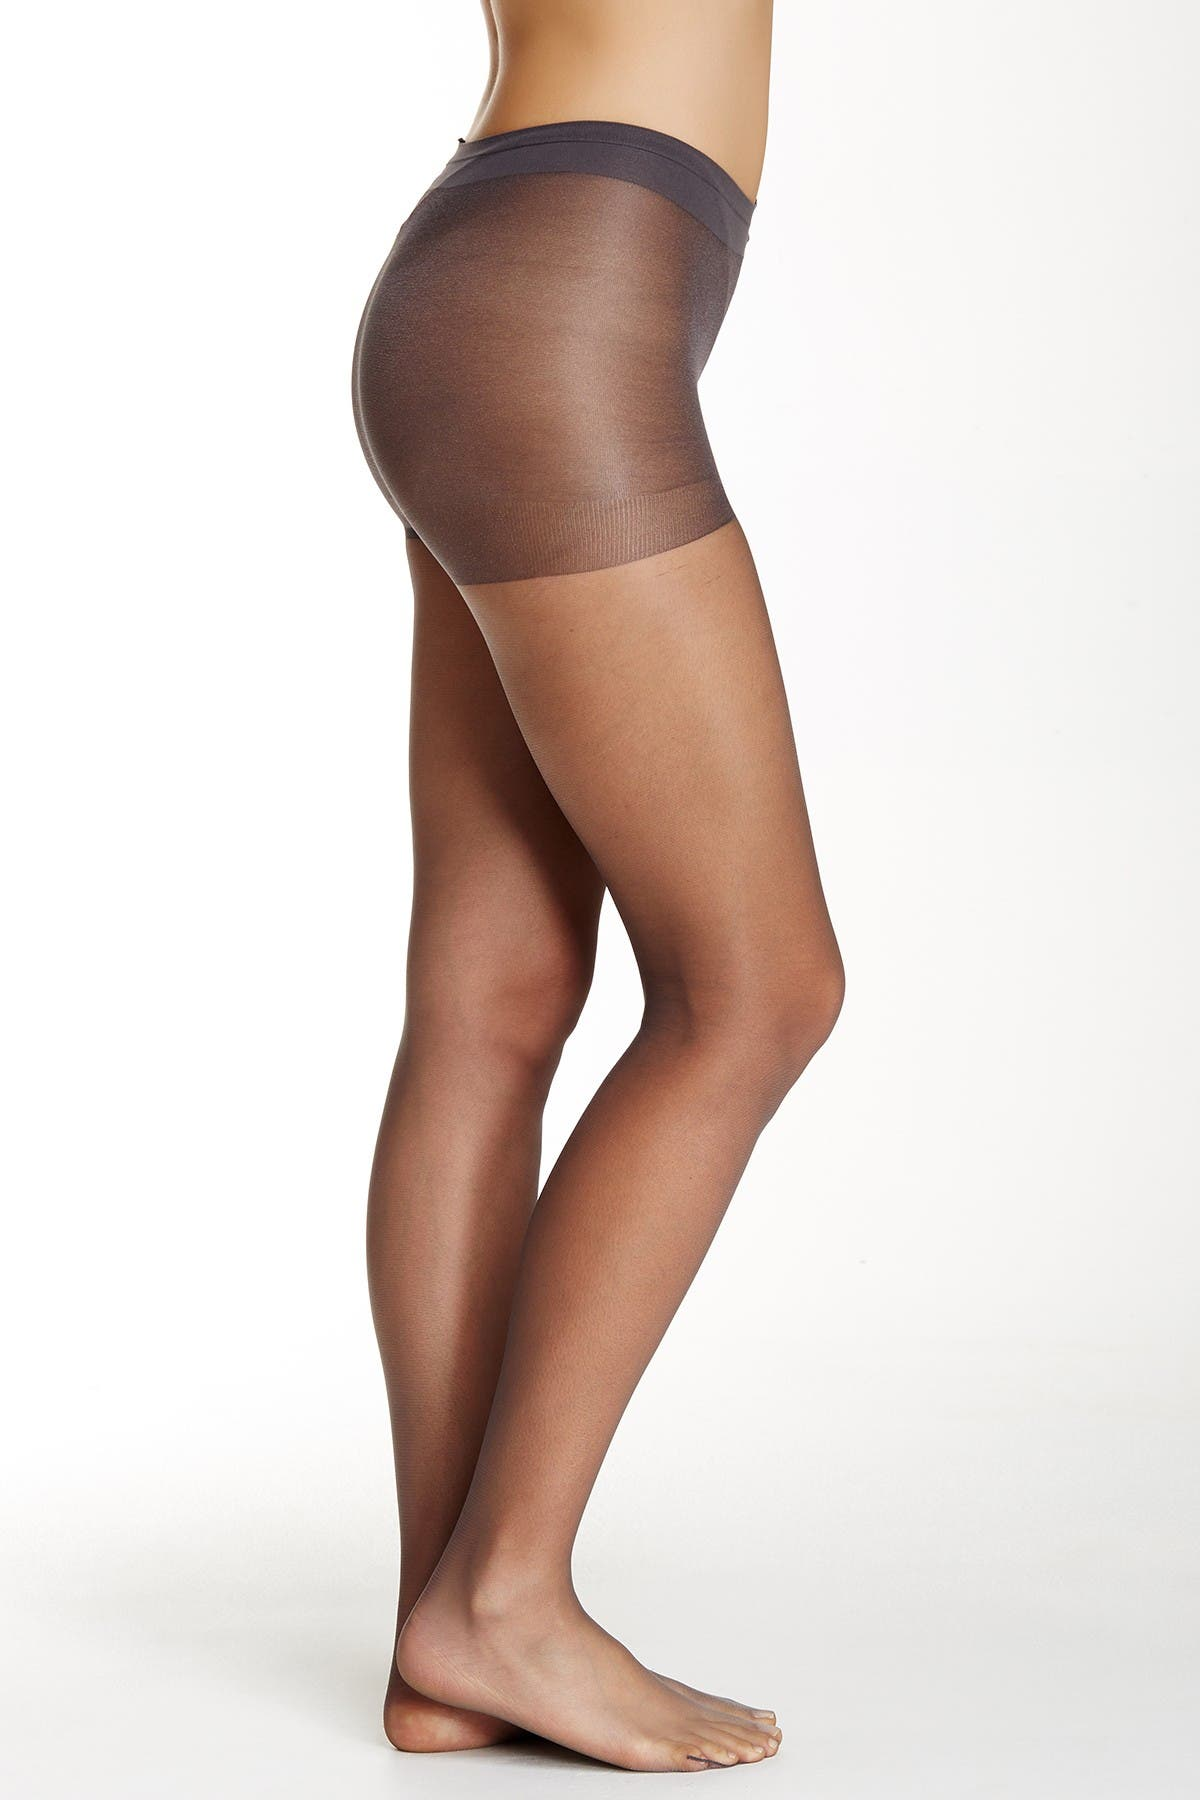 Image of shimera Everyday Sheer Control Top Pantyhose